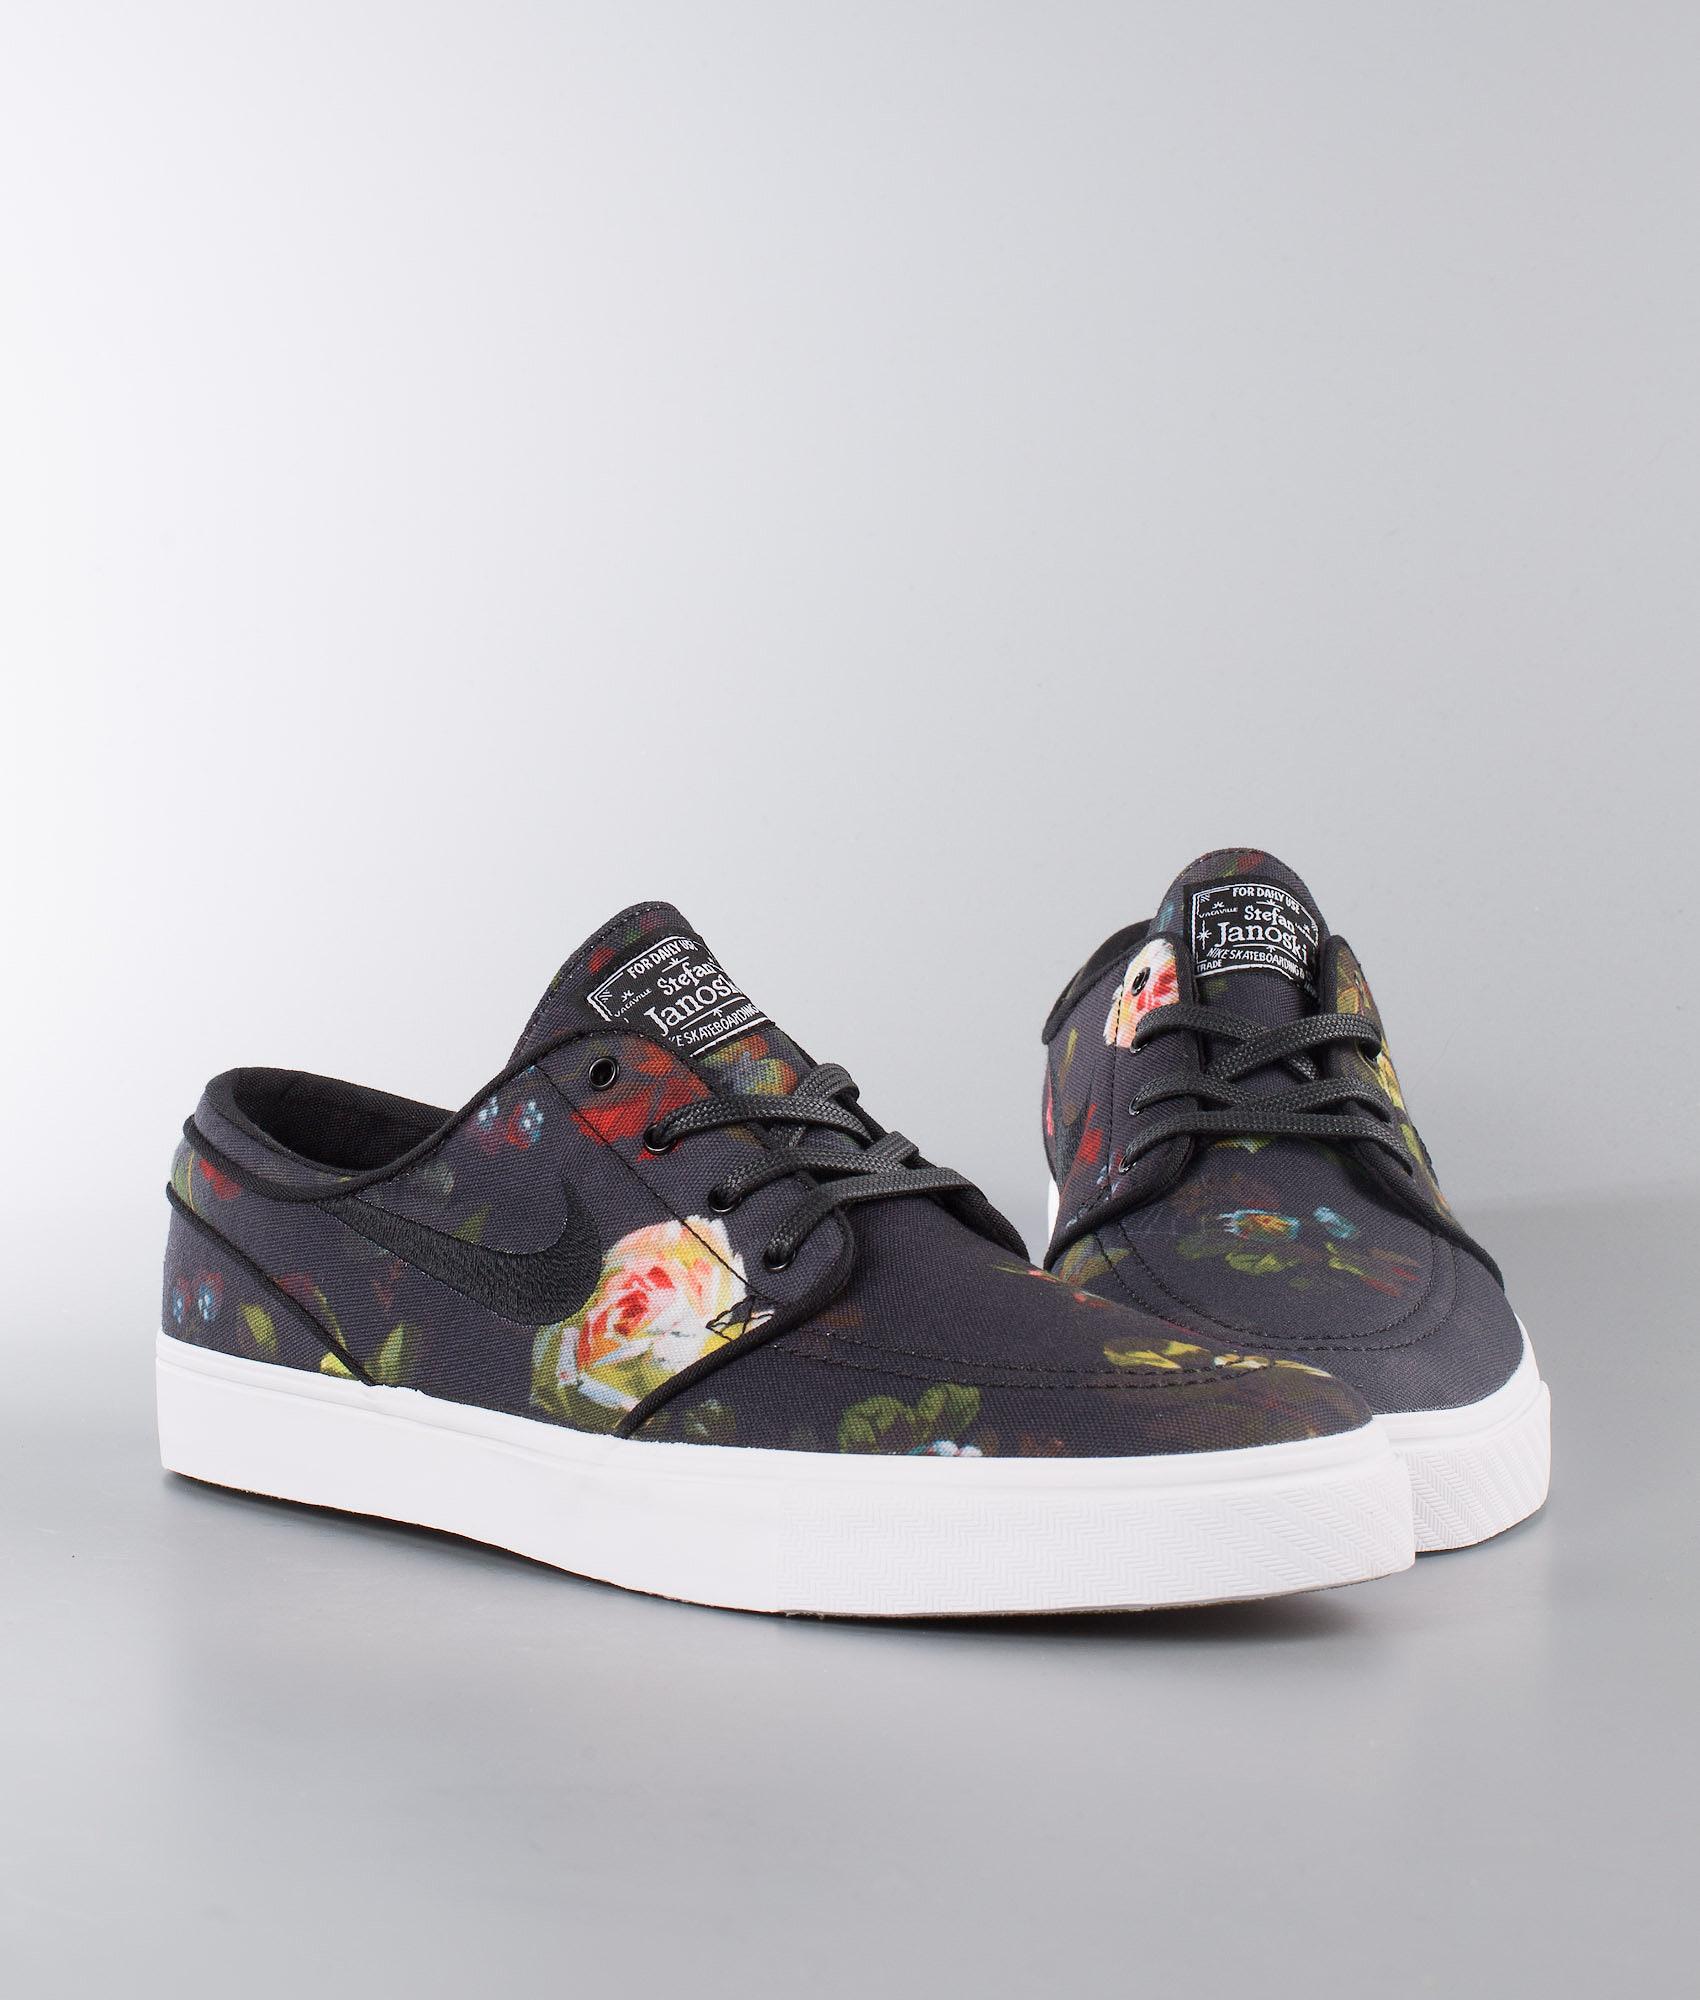 10dc6b12538 Nike Zoom Stefan Janoski Cnvs Shoes Multi-Color Black-White-Gum ...